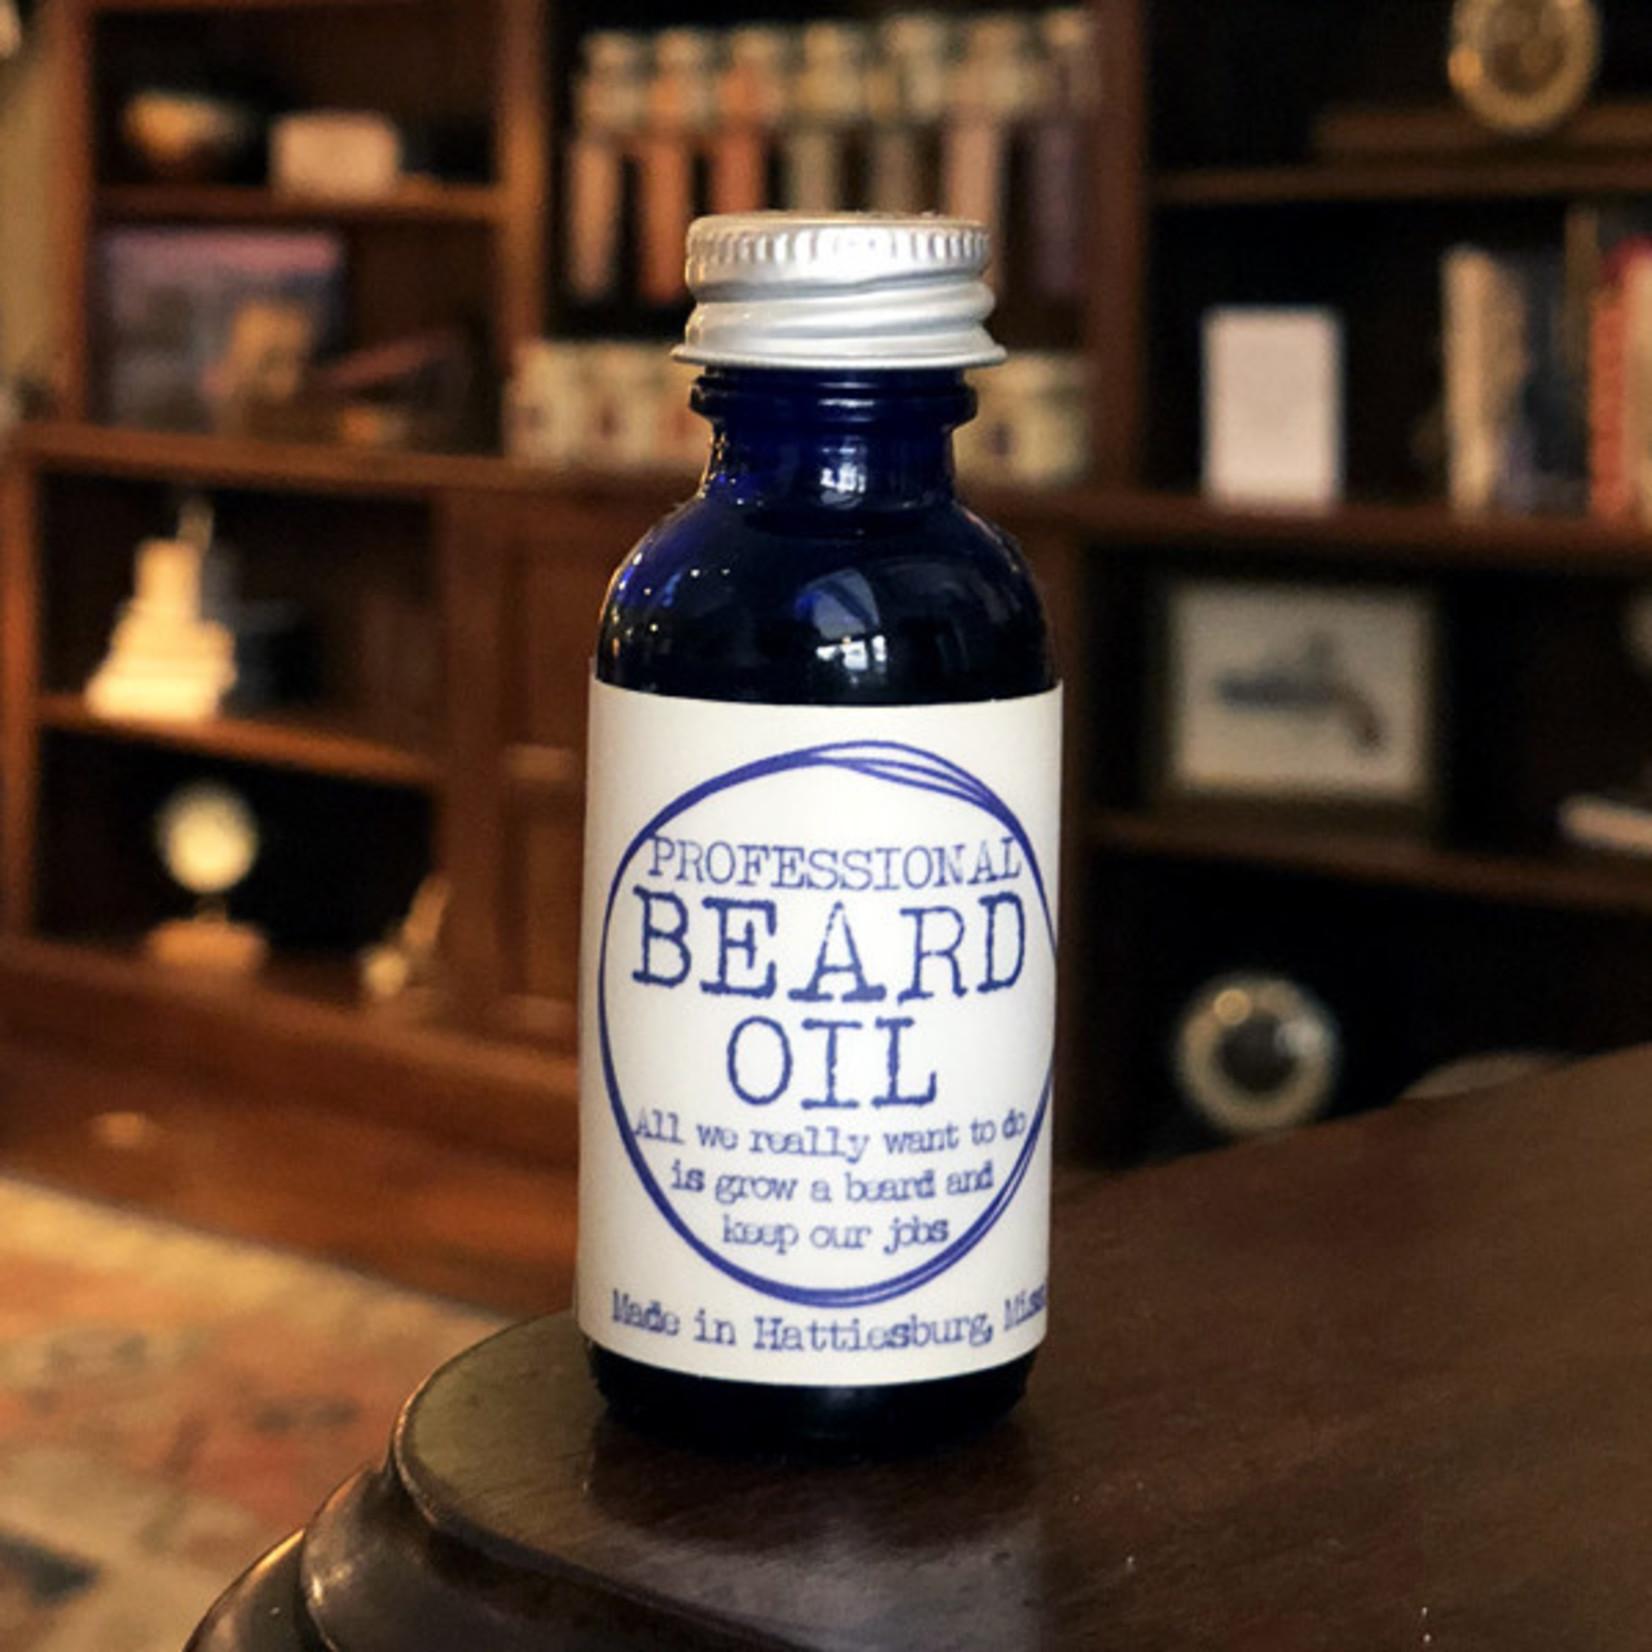 Professional Beard Oil Professional Beard Oil